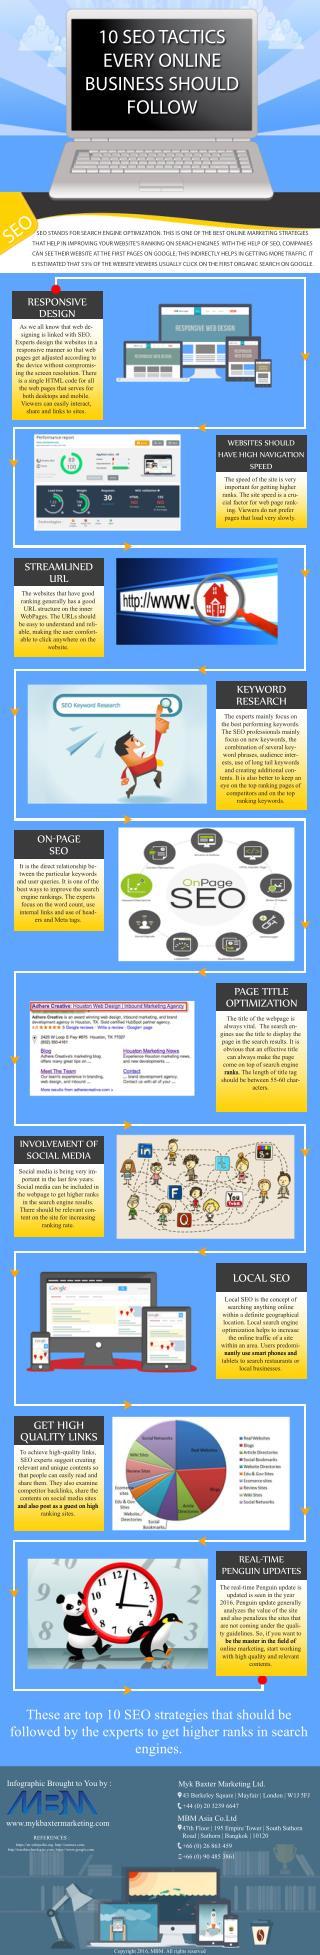 10 SEO Tactics Every Online Business Should Follow